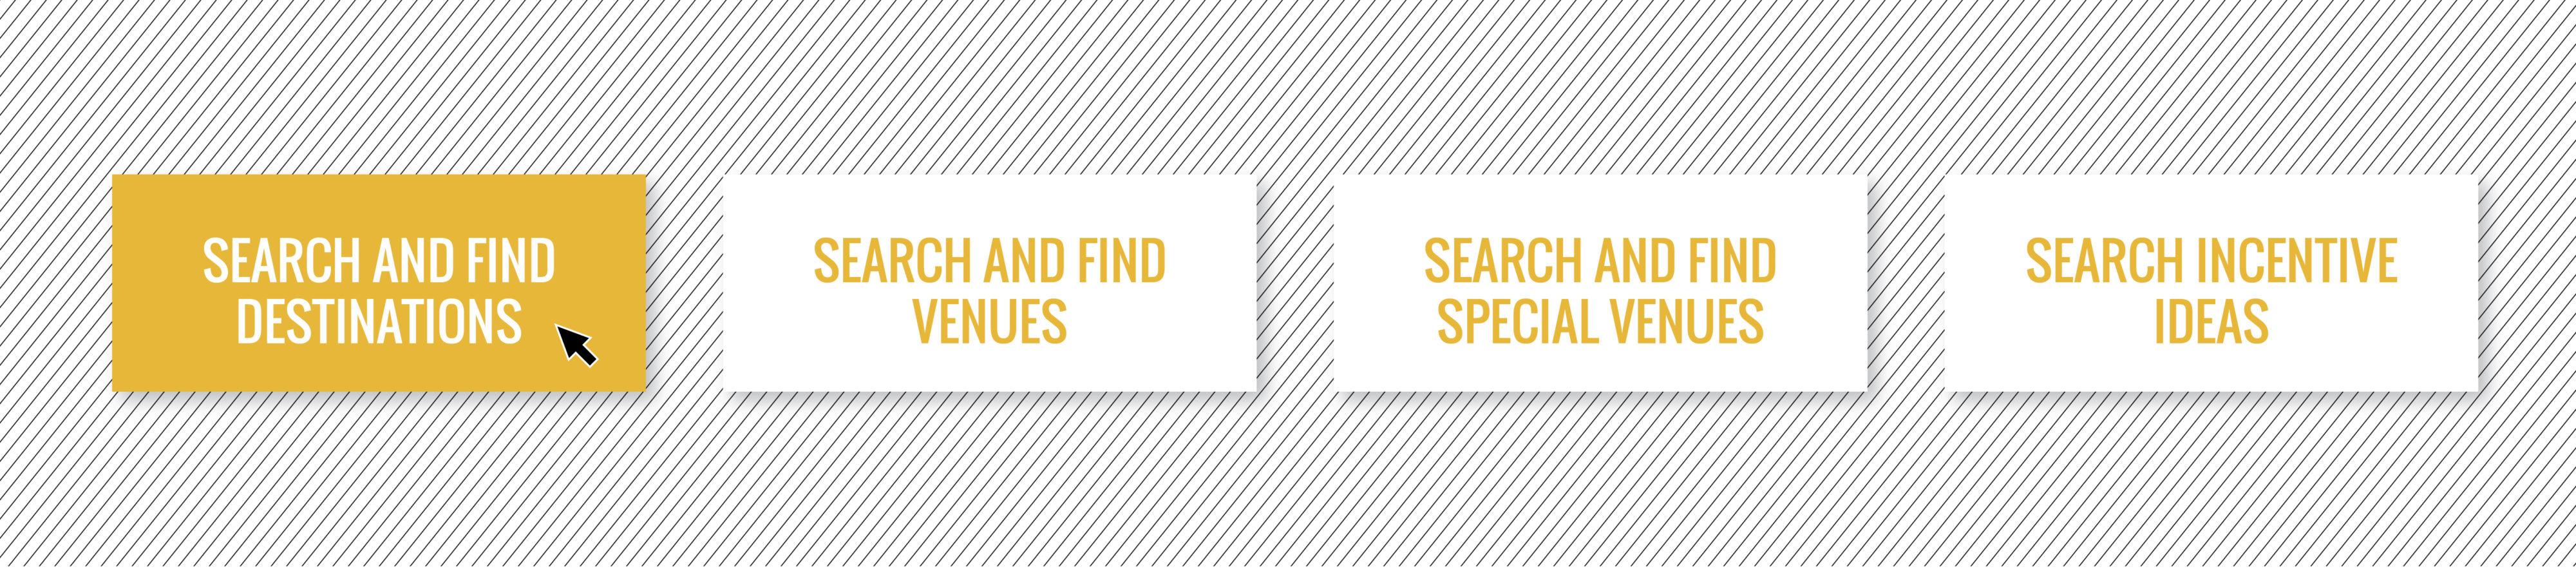 kongres-magazine-search-engine-special-venues-iskalnik